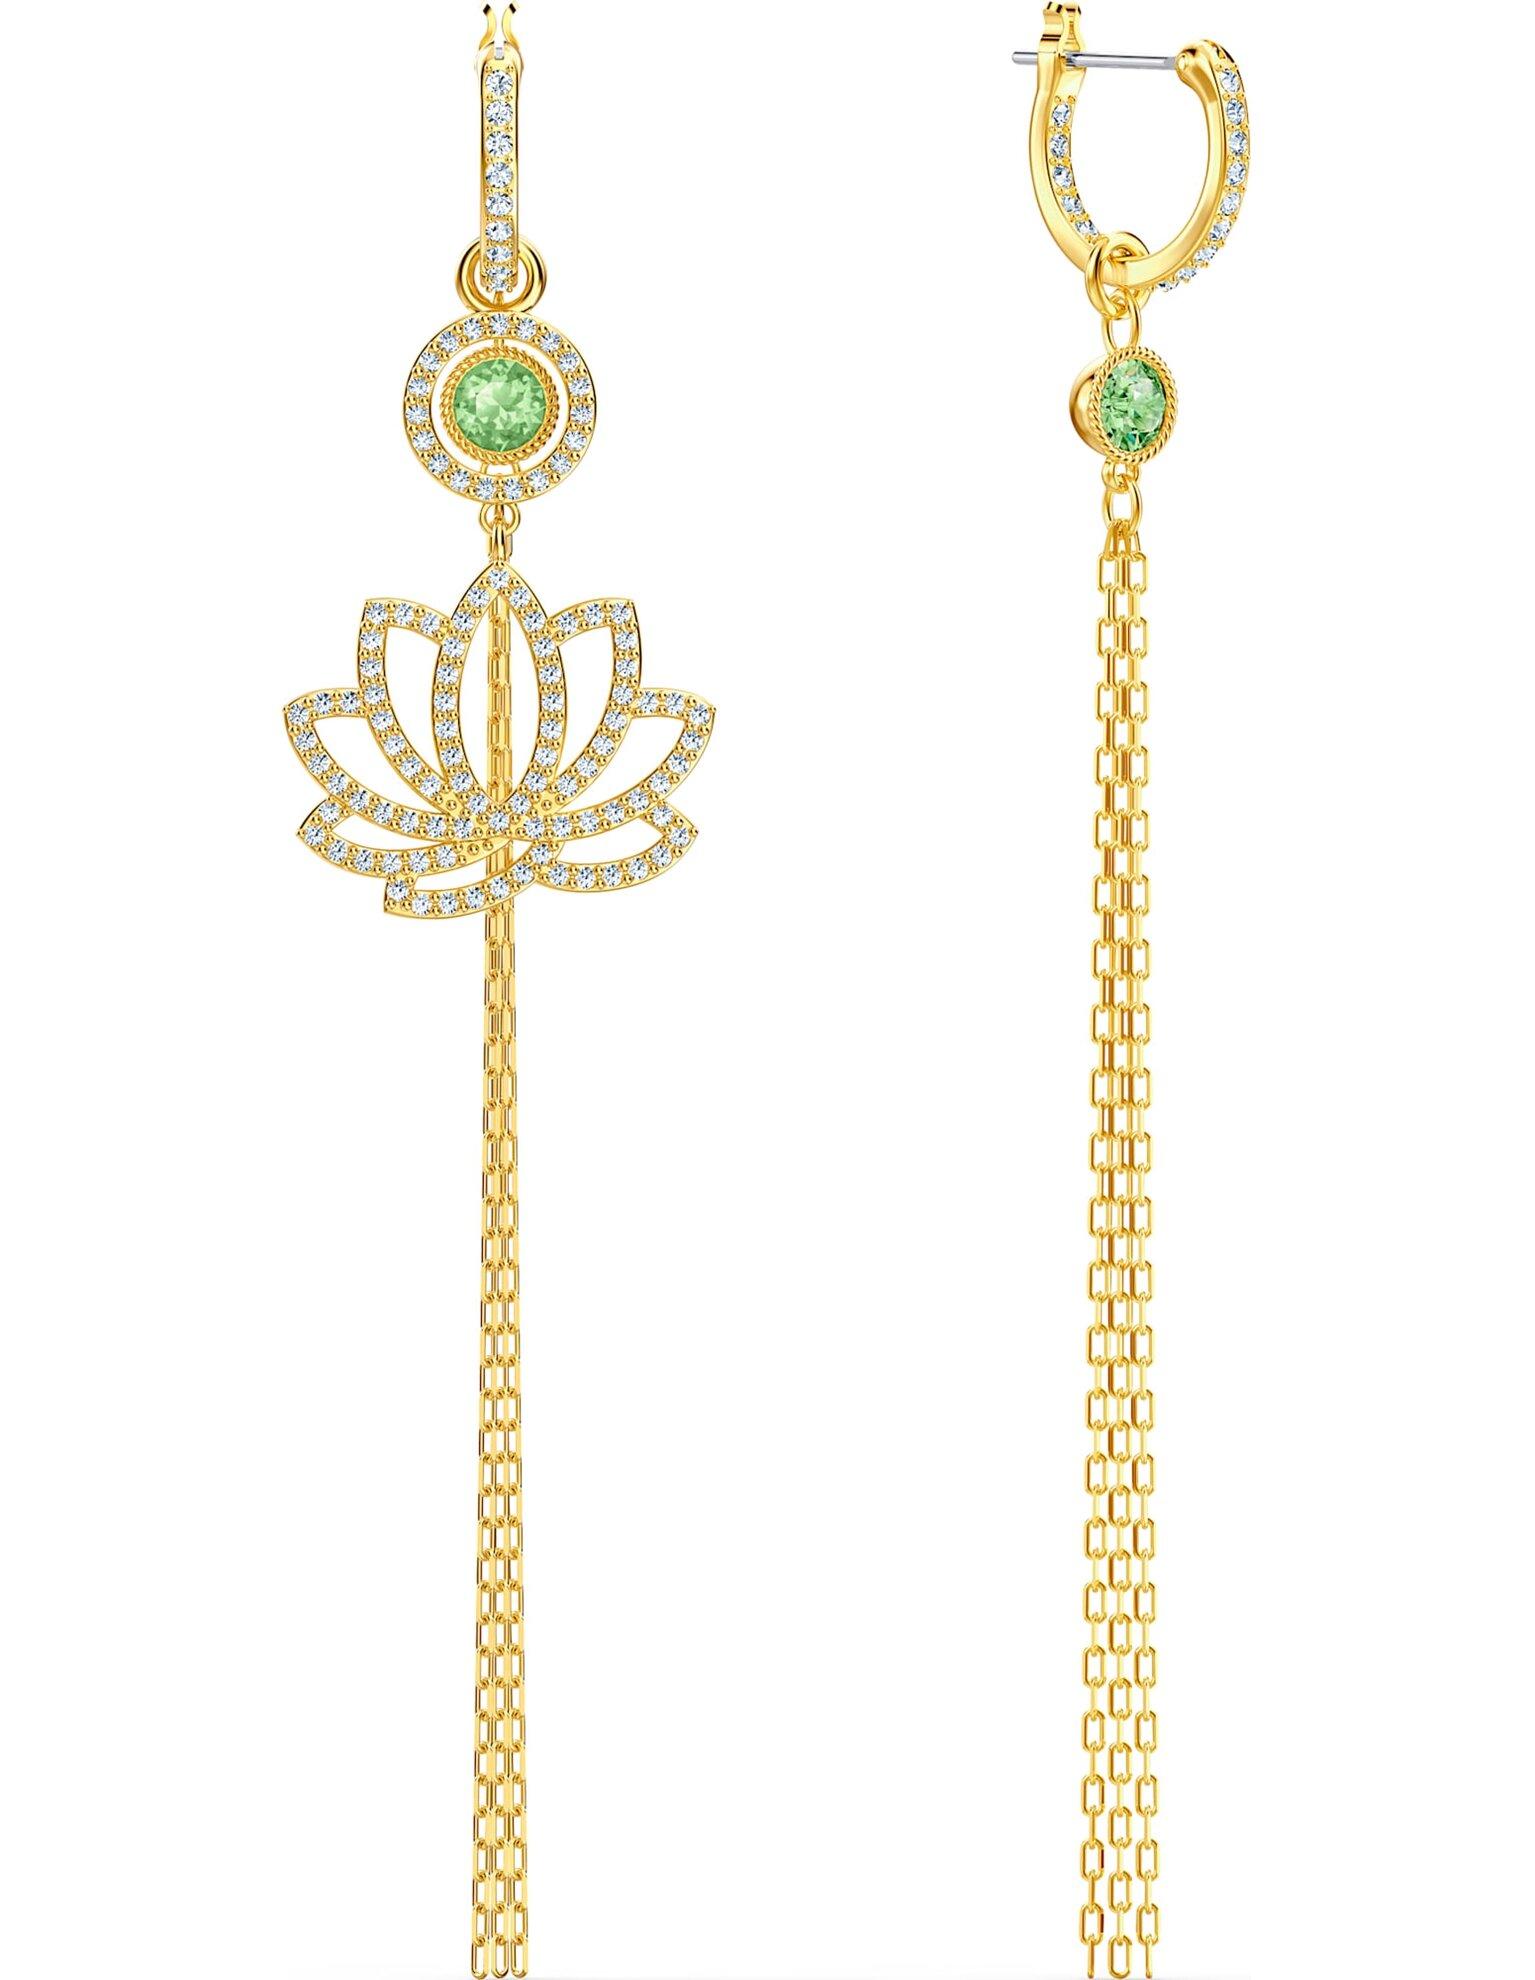 Picture of Swarovski Symbolic Lotus İğneli Küpeler, Yeşil, Altın rengi kaplama